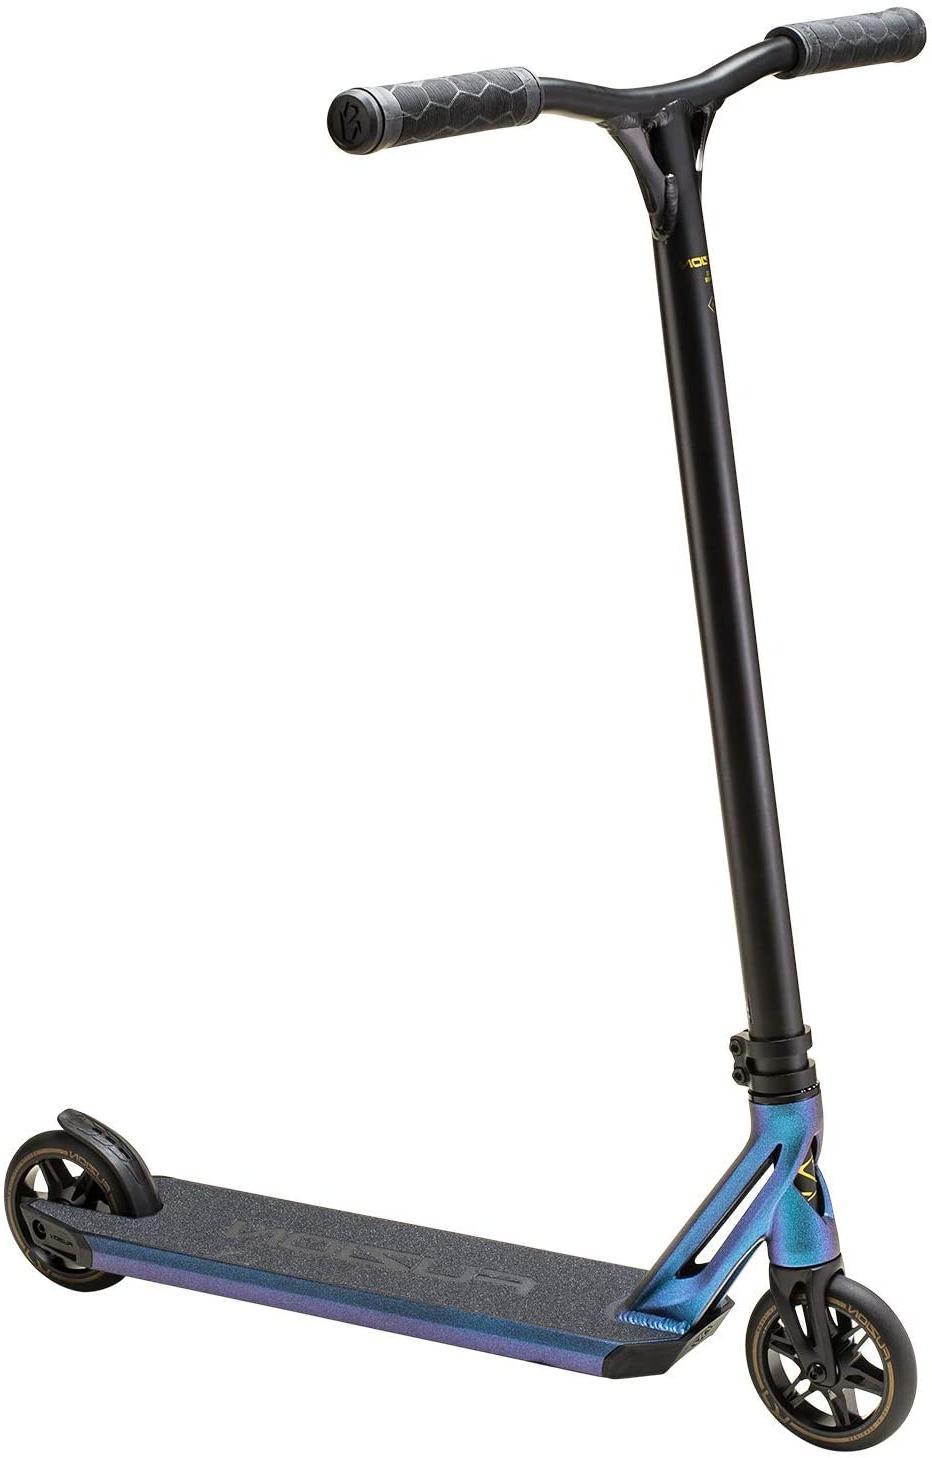 z375 pro scooter complete 2019 kraken 2019